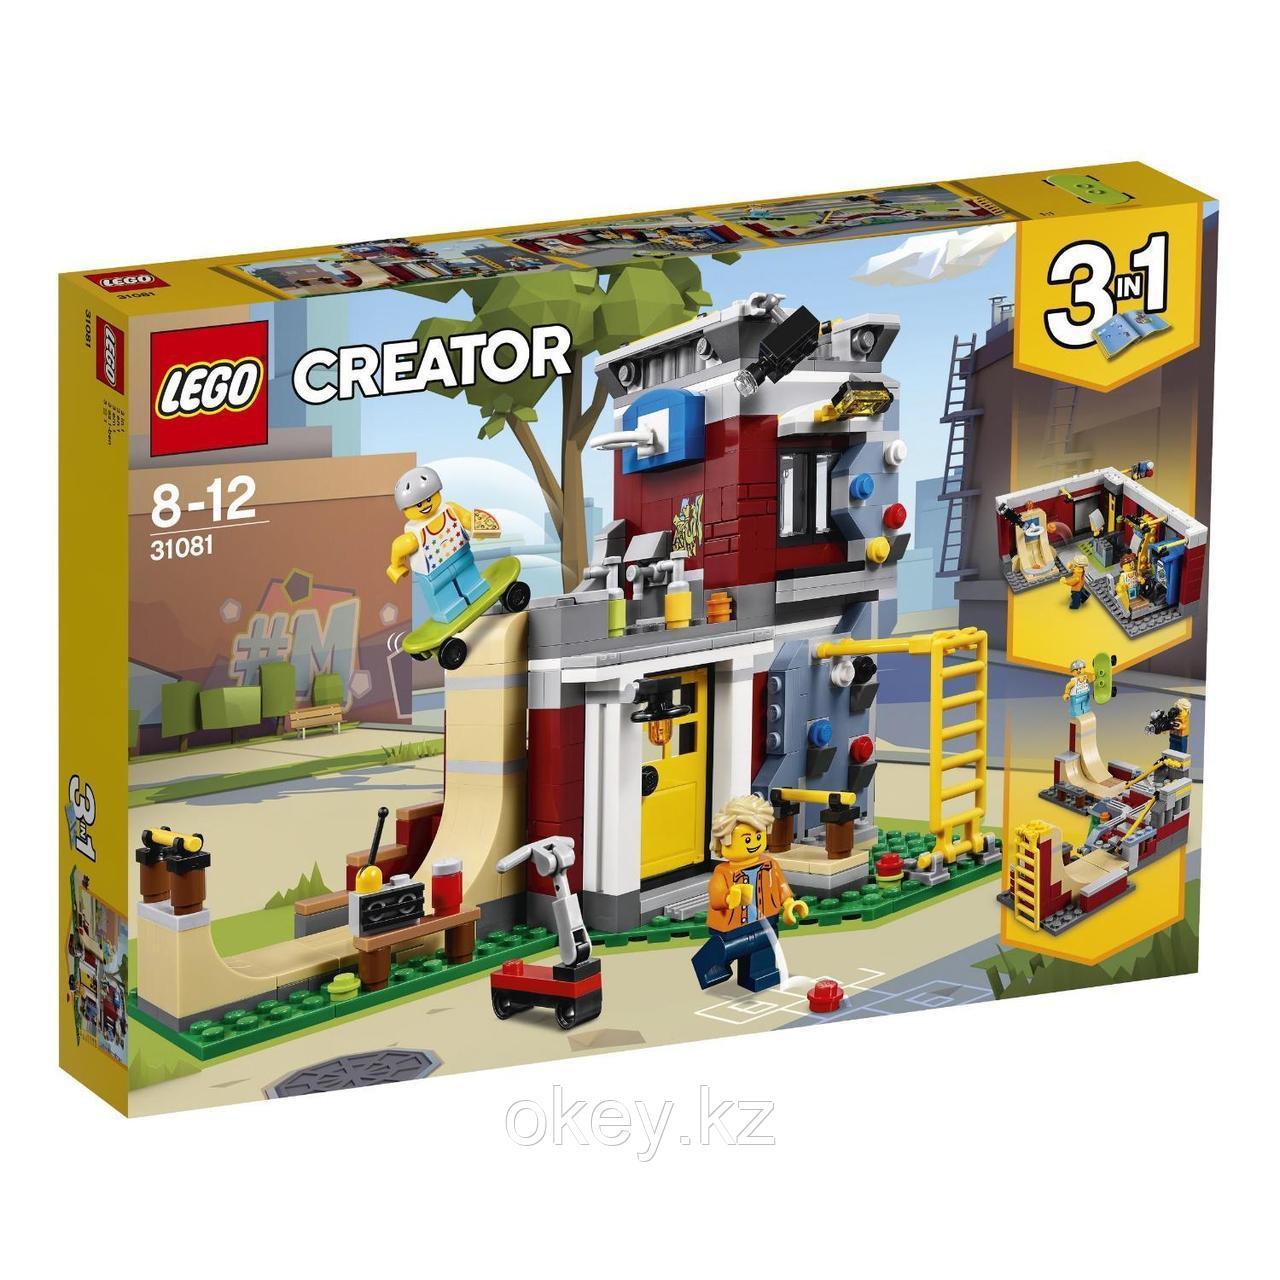 LEGO Creator: Скейт-площадка 31081